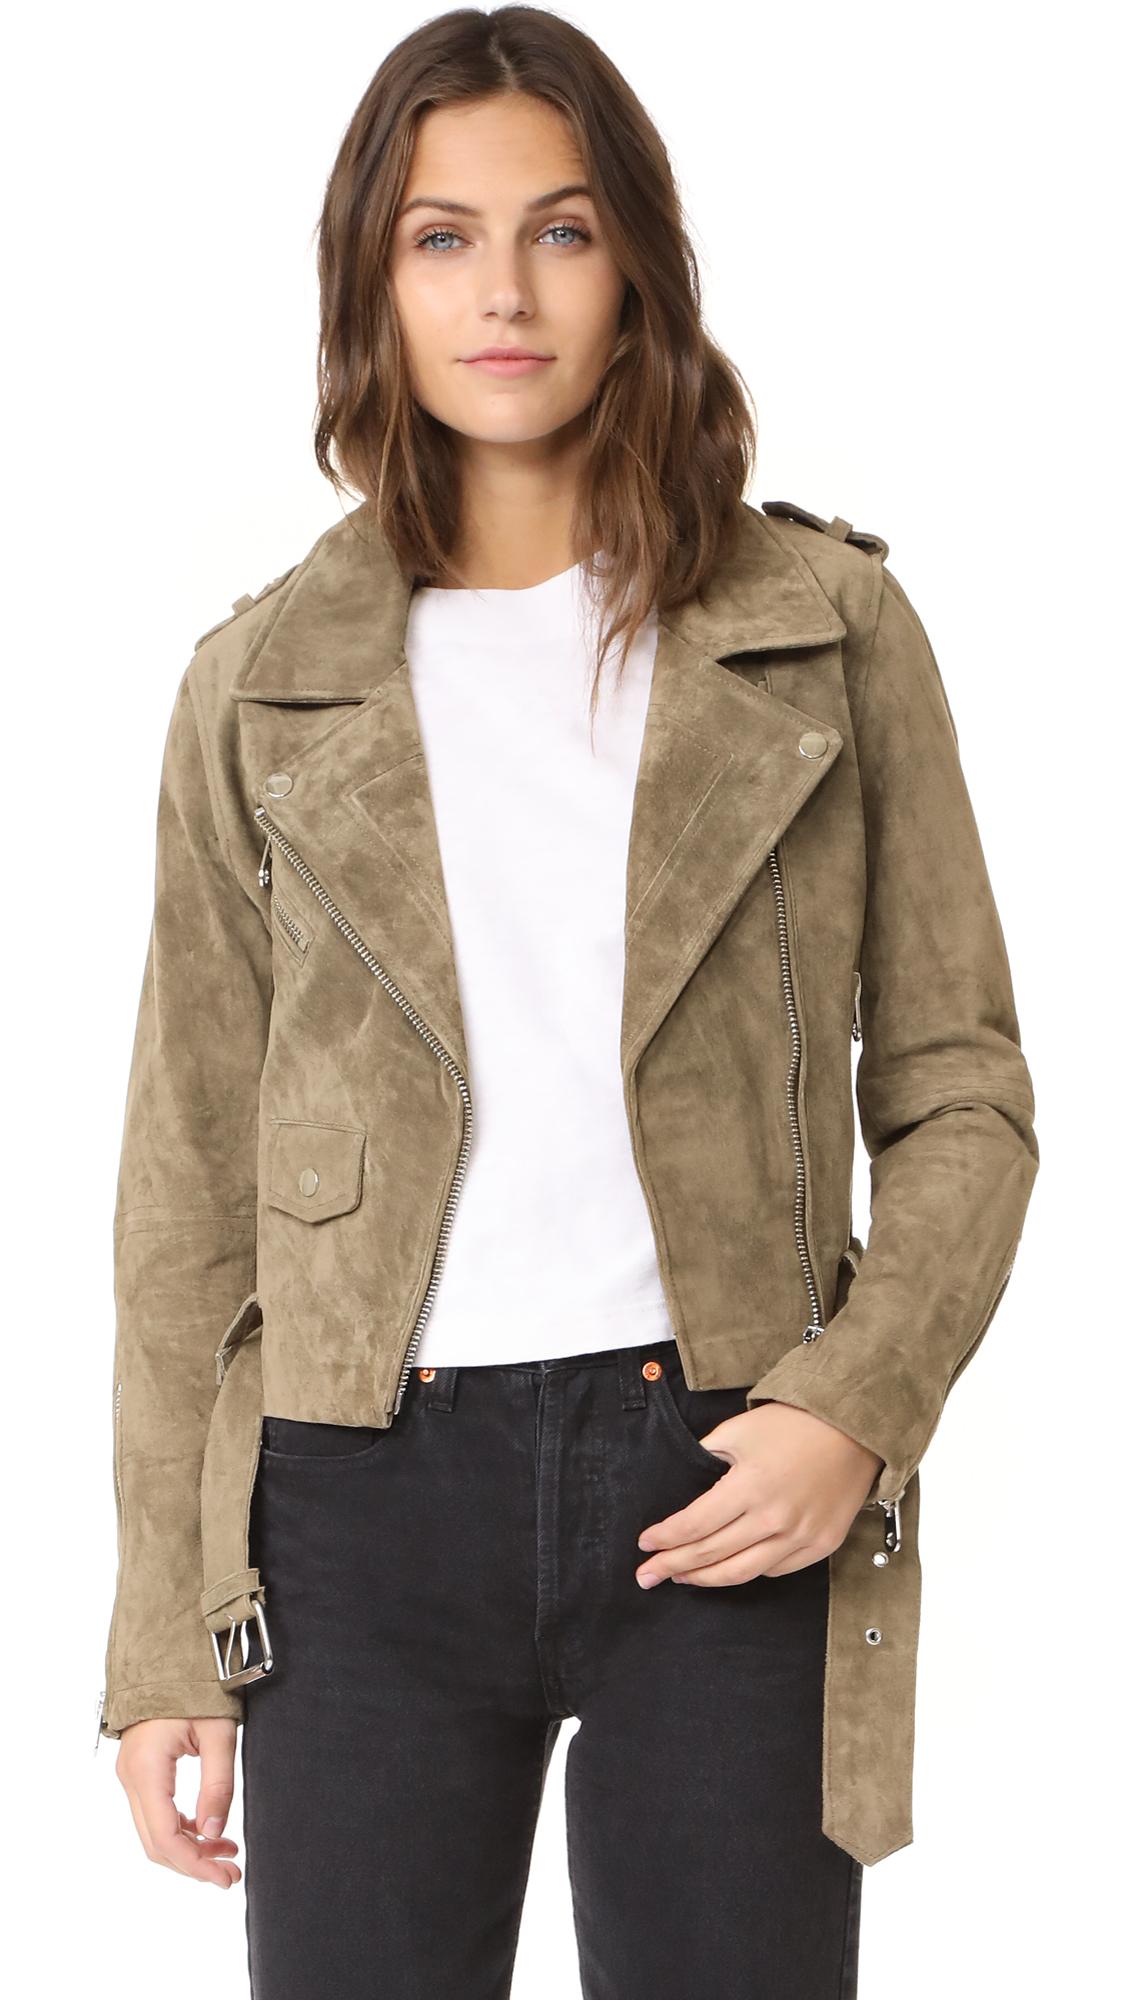 Driftwood Suede Moto Jacket - Dark Olive